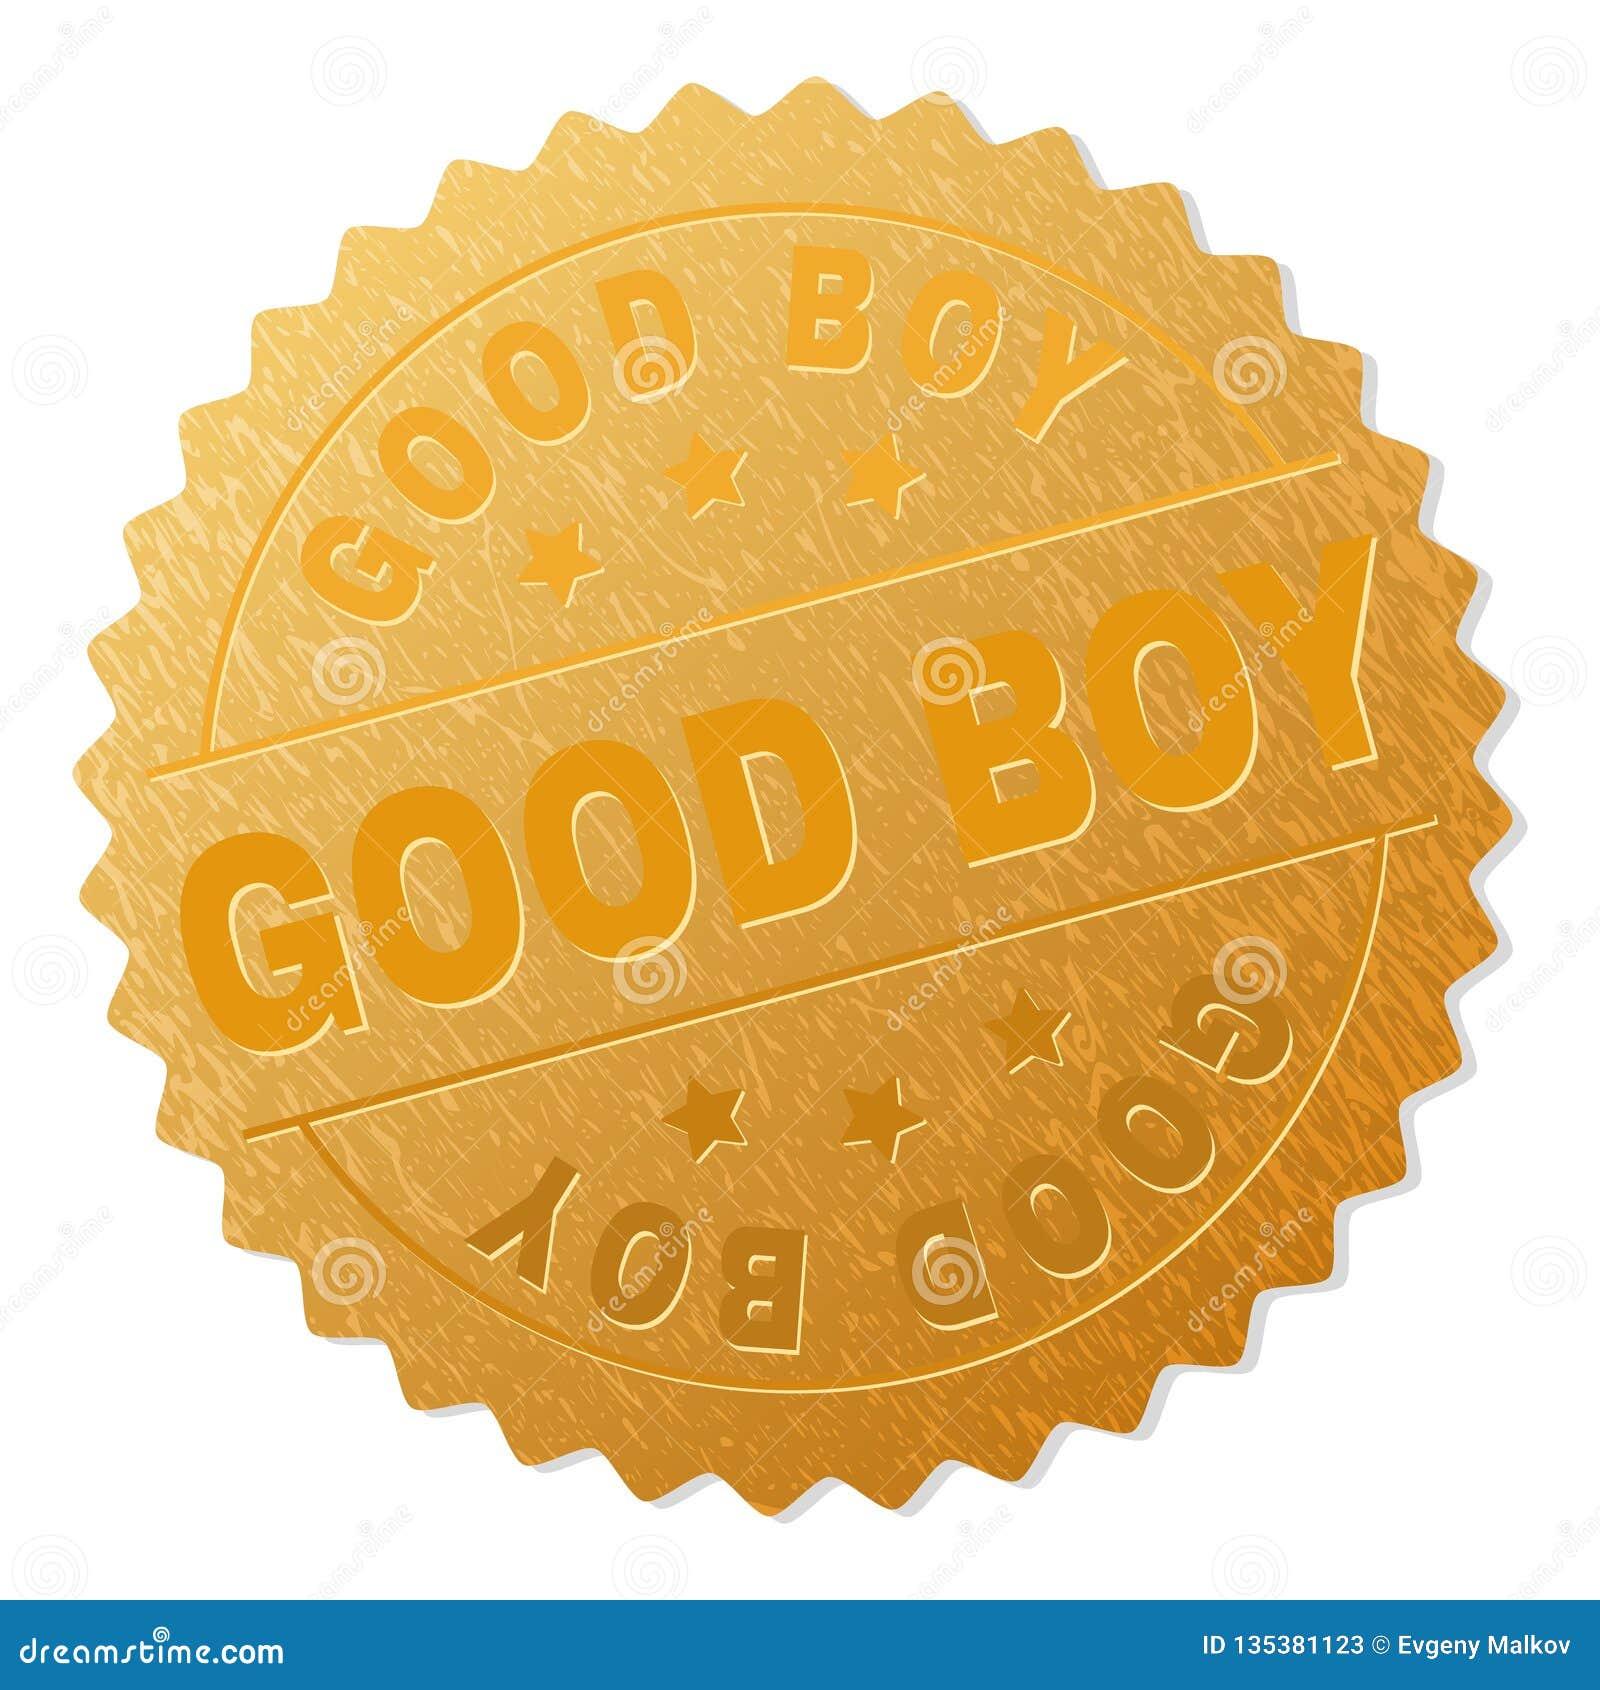 Golden GOOD BOY Award Stamp Stock Vector - Illustration of badge, gold:  135381123